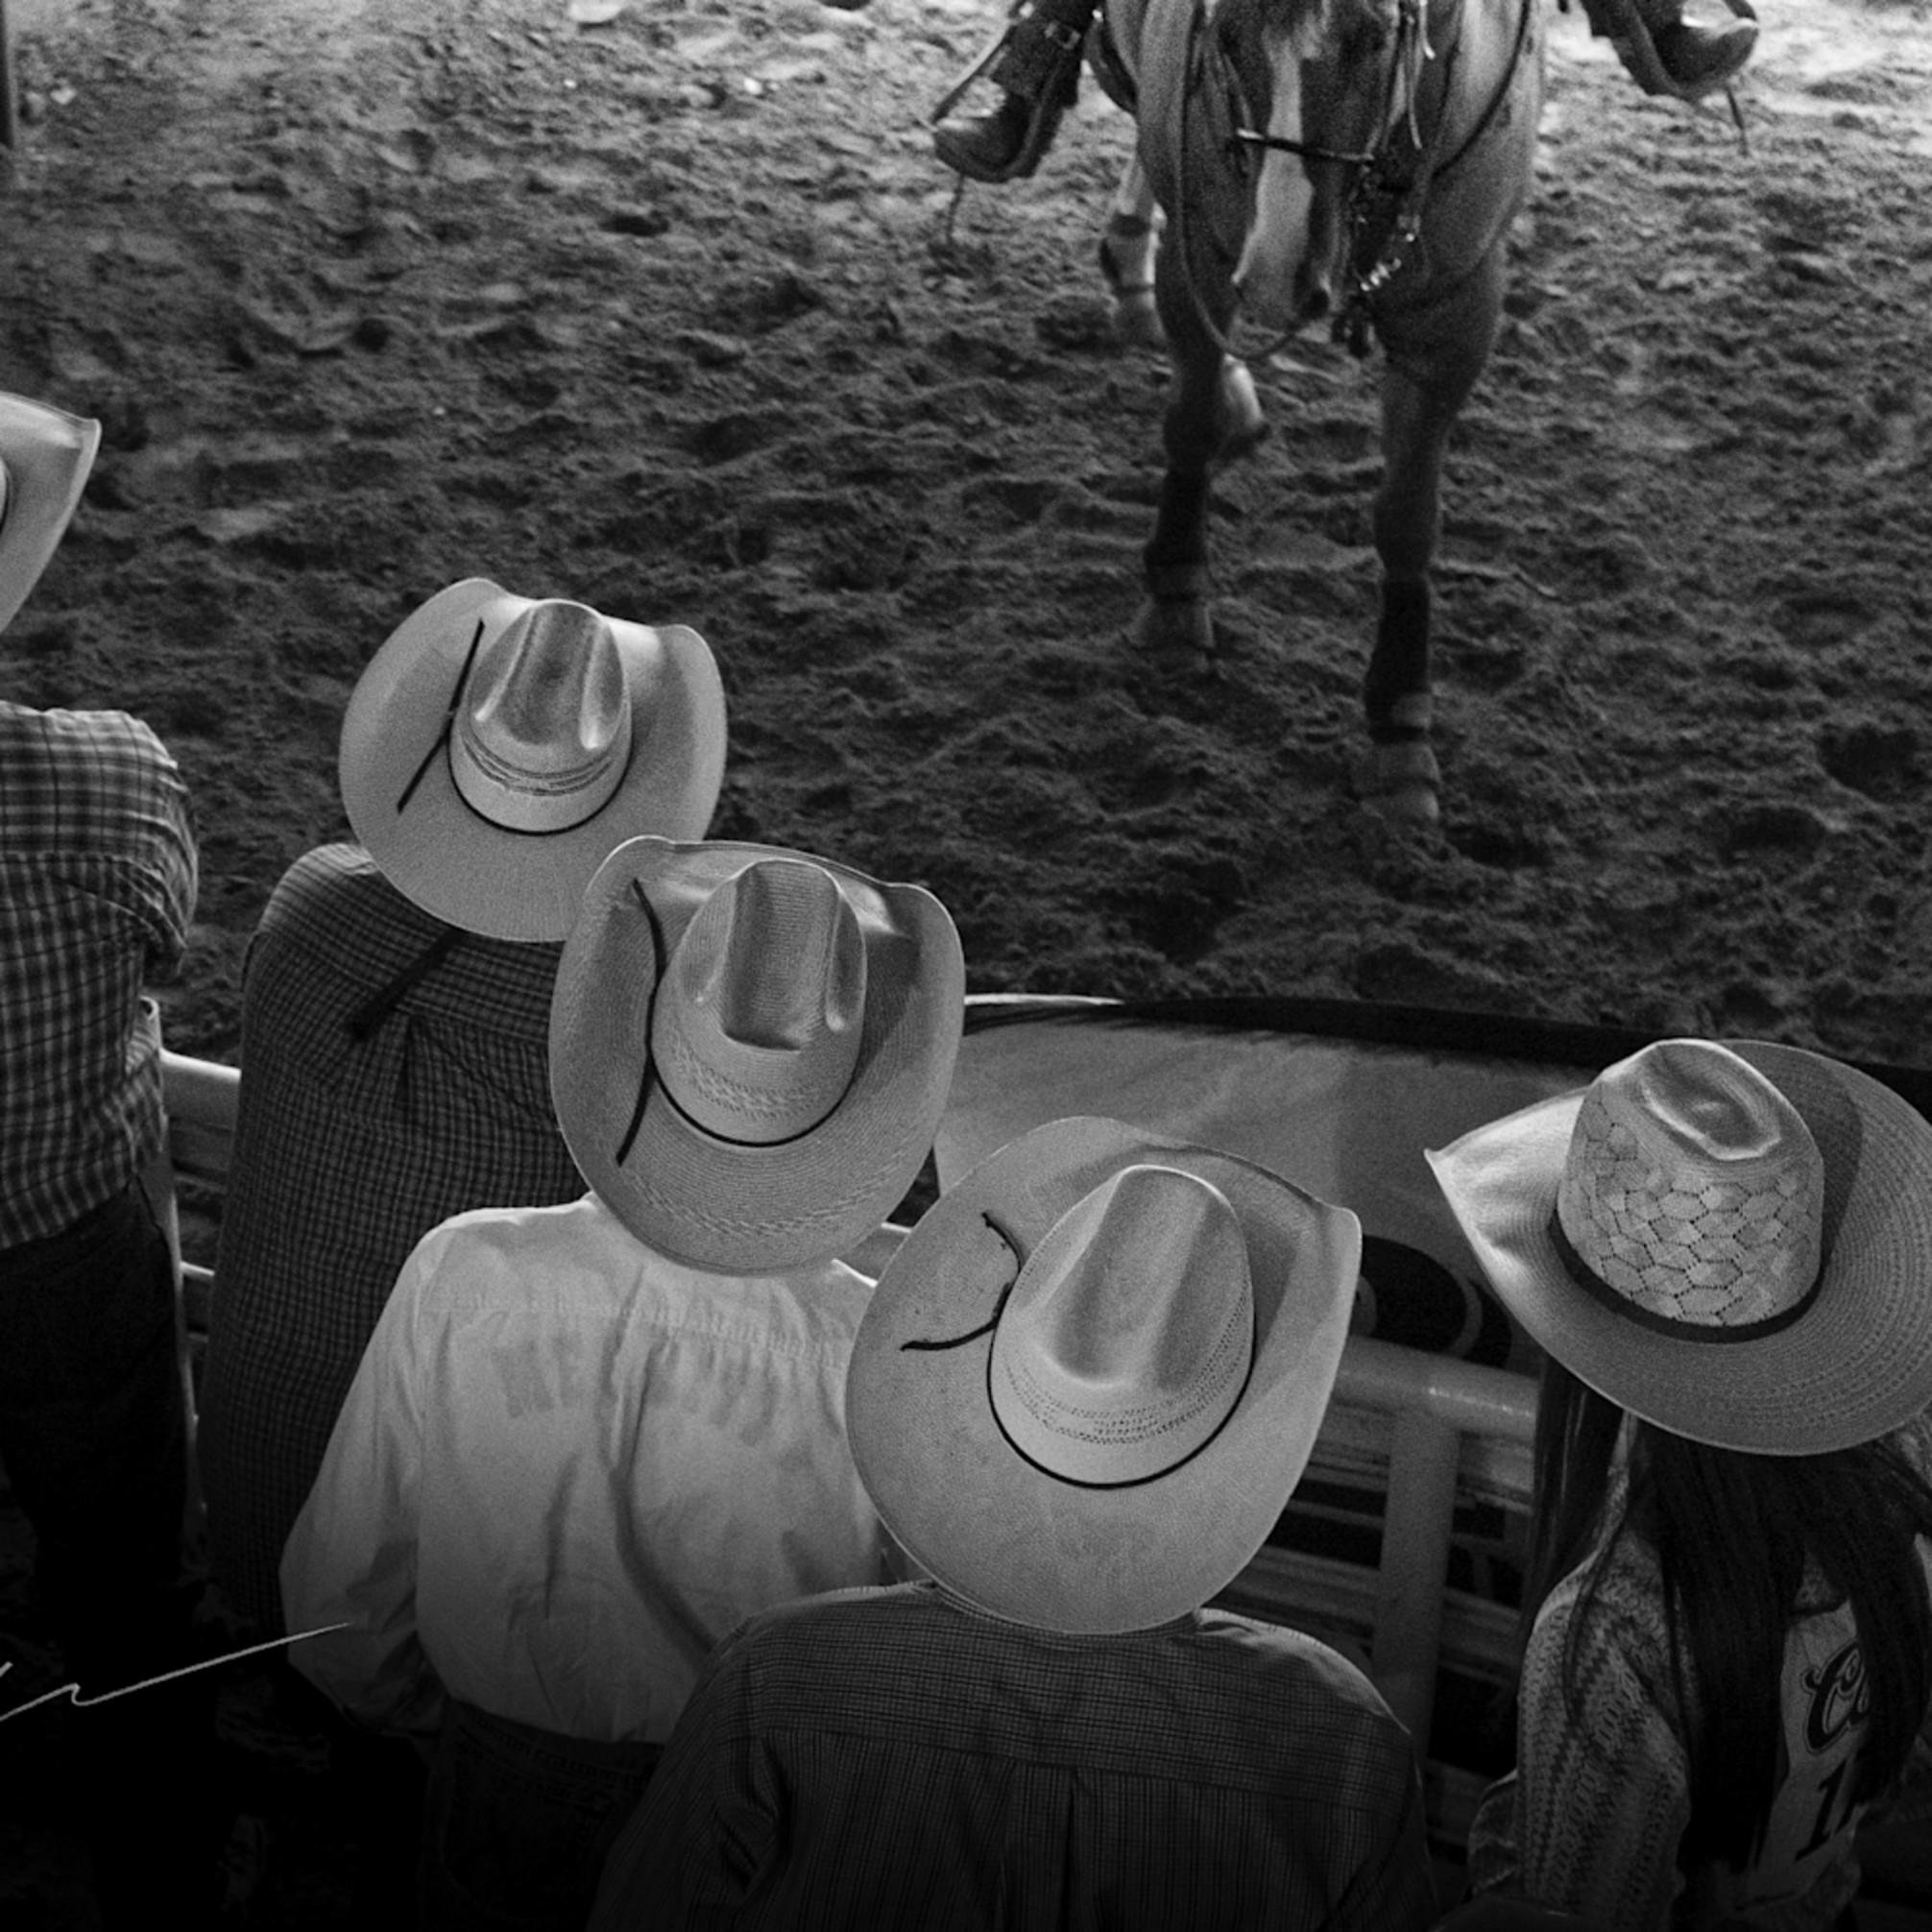 Cowboy reunion 2016 0949 591 tlu40p